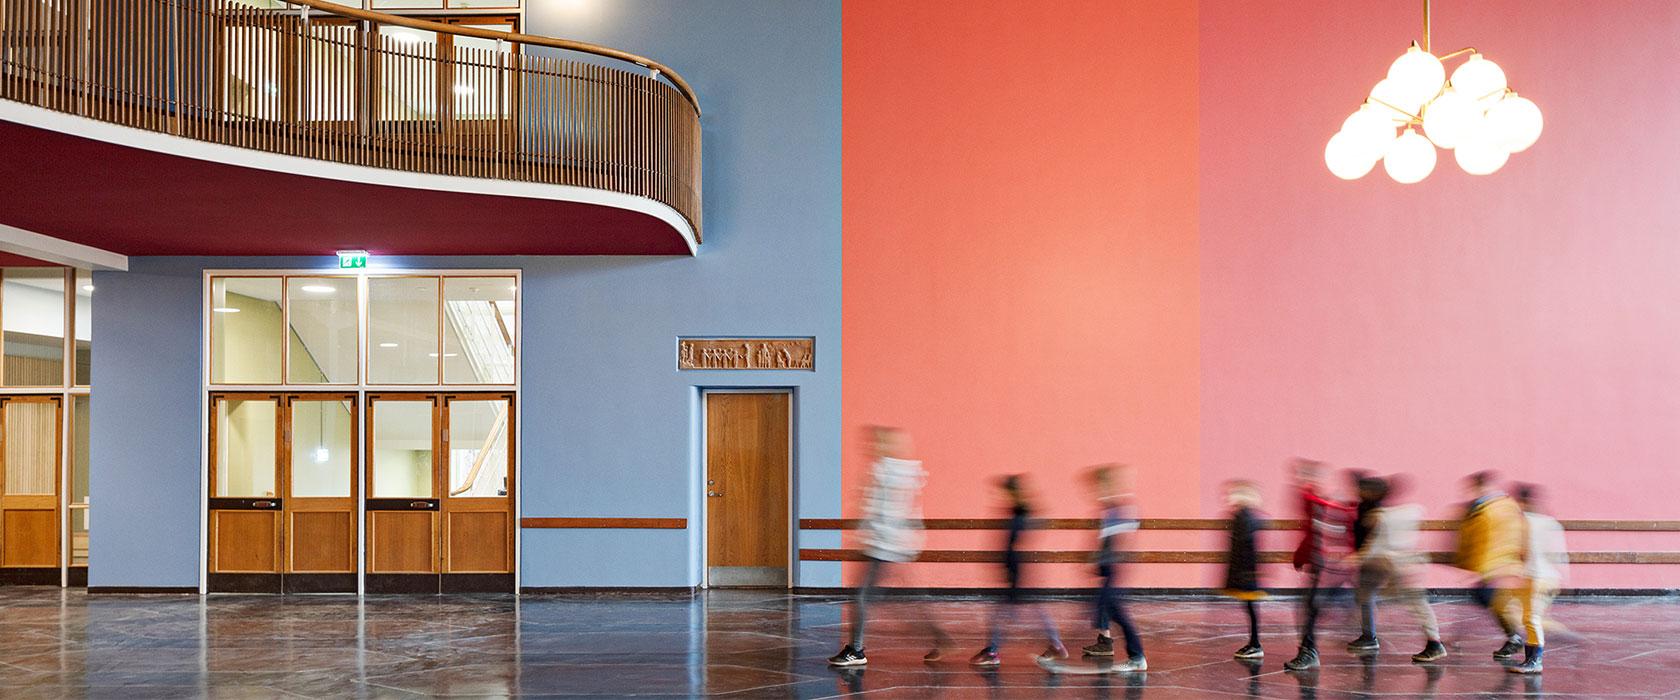 Lundehusskolens aula